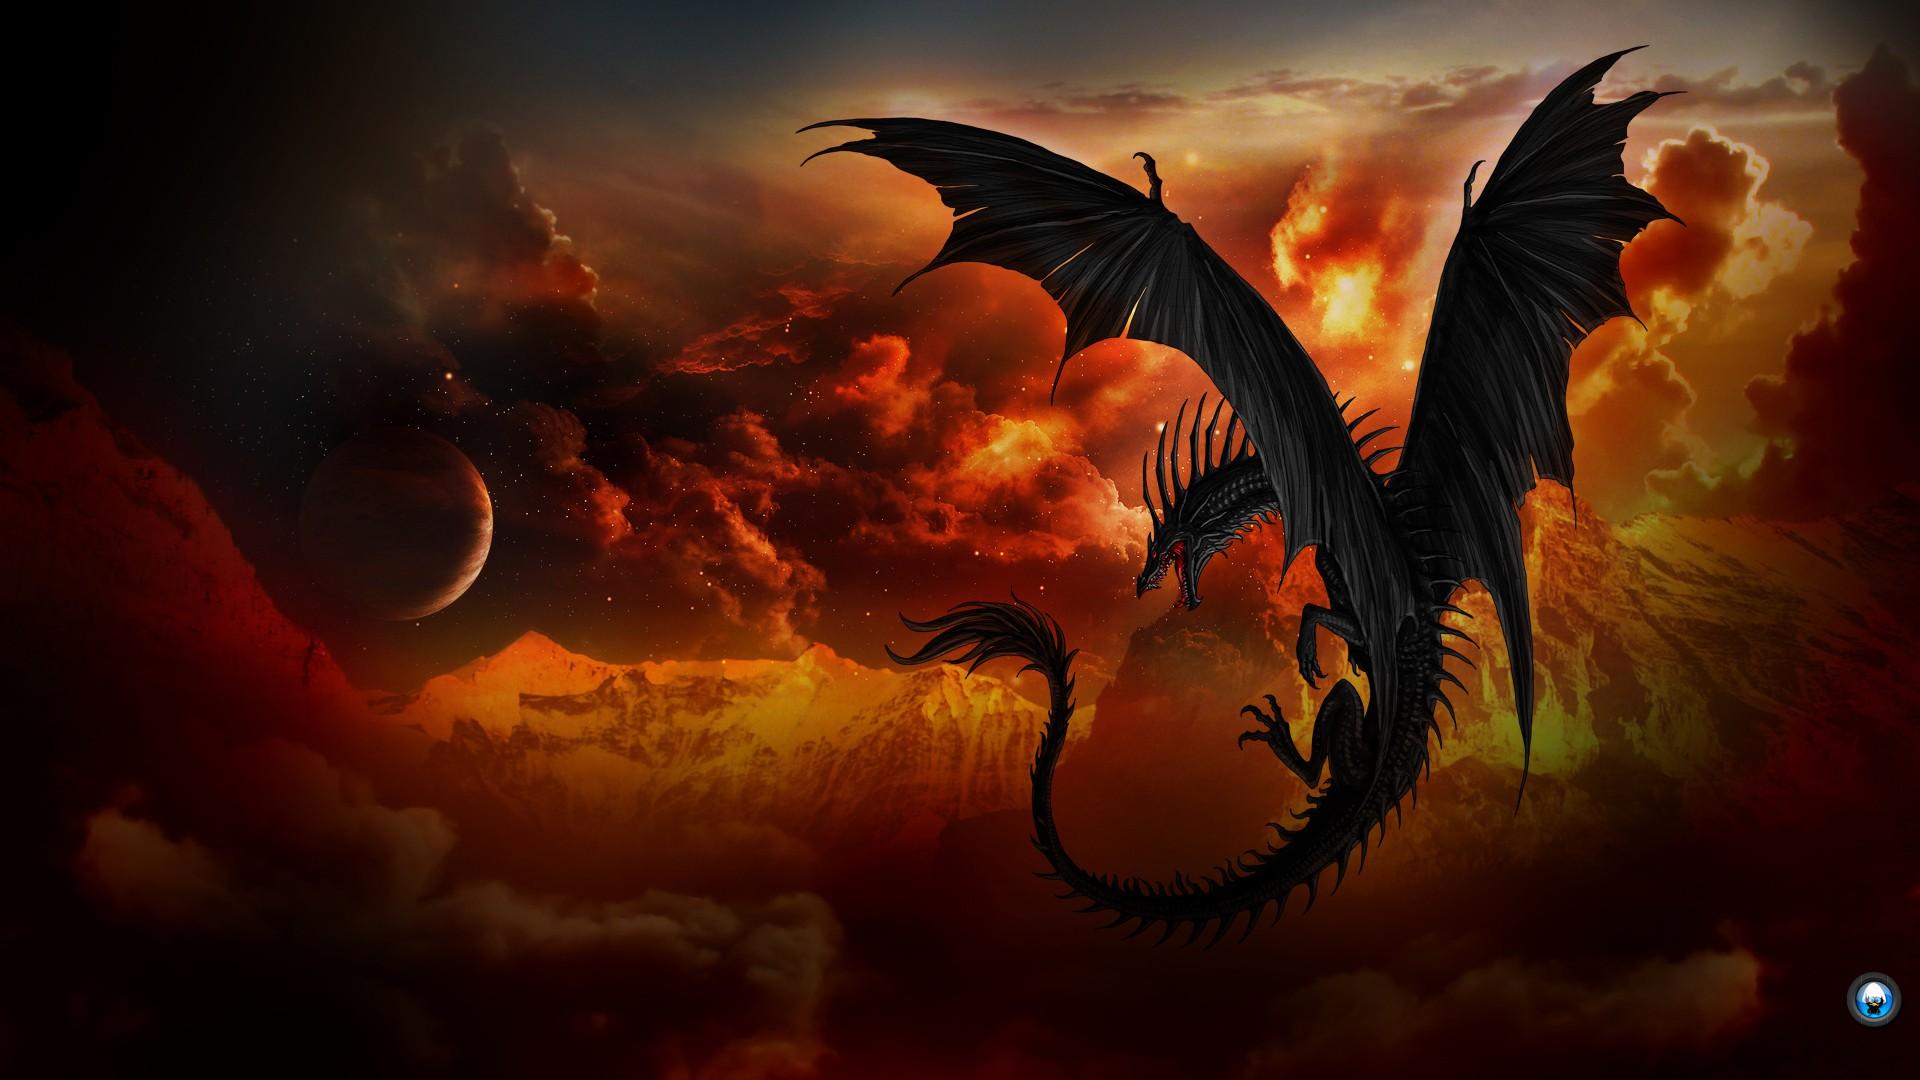 Dragon background download free amazing full hd for Immagini full hd 1920x1080